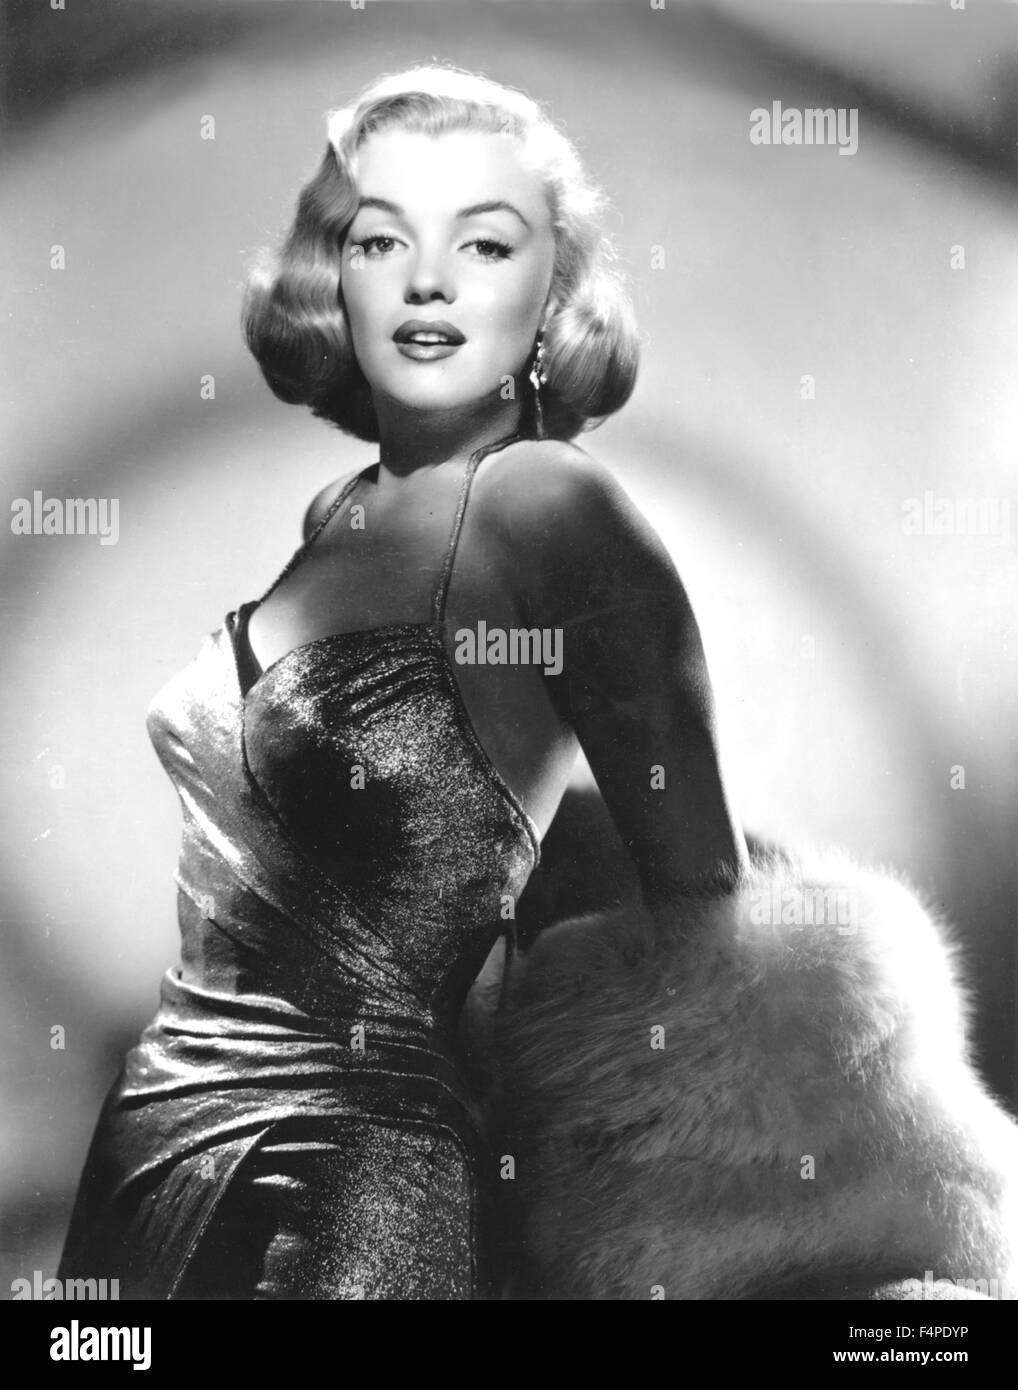 Marilyn Monroe in 1950 - Stock Image